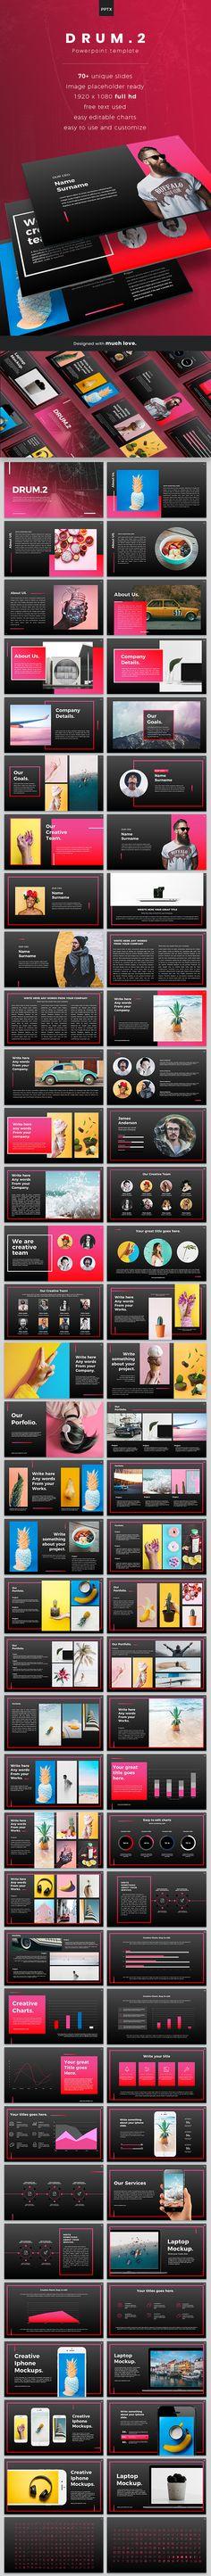 97 Best Design Inspiration images in 2019 | Editorial design ...